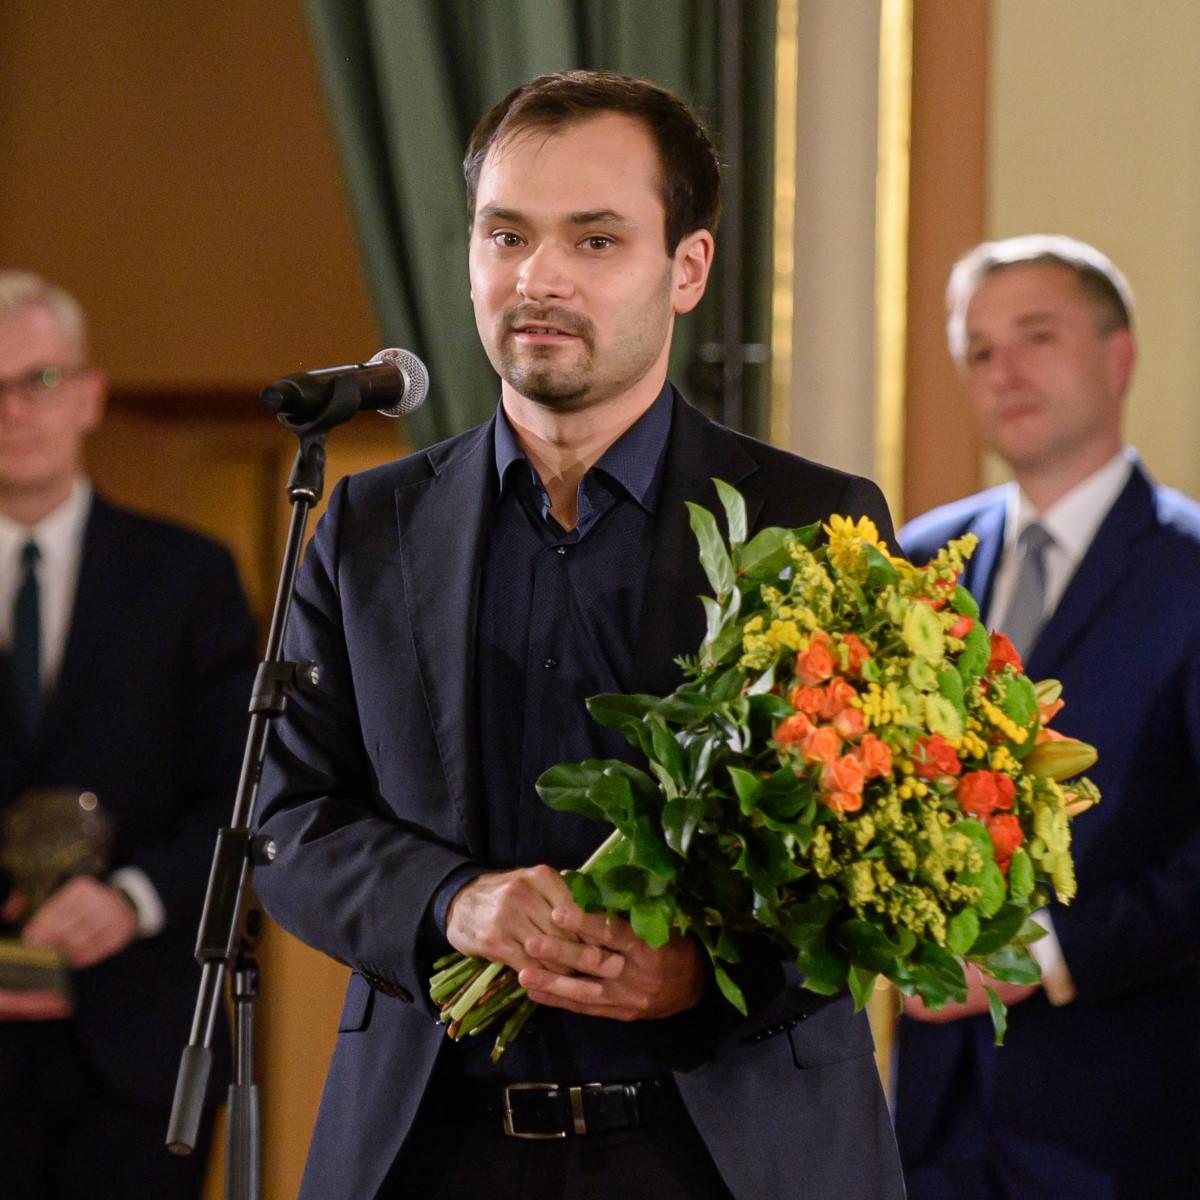 Janusz Wawrowski Laureat Muzyka Norwid 2019